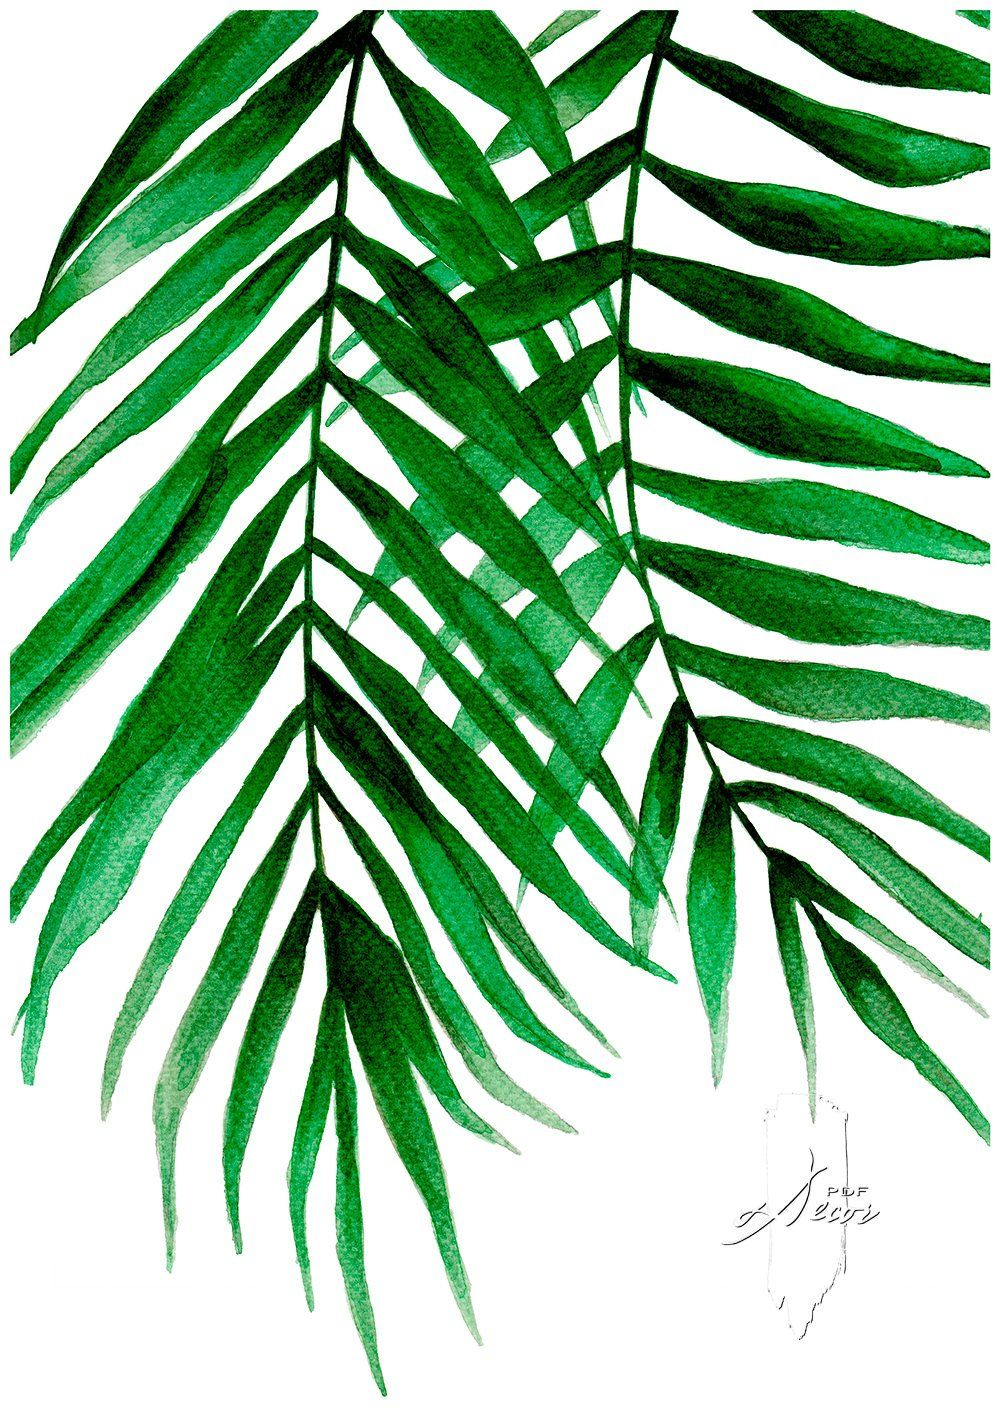 Tropical Leaves Set Set Of 3 Leaves Prints Set Of 3 Wall Art Tropical Print Watercolor Leaves Leaves Print Wall Art Art Prints Art Watercolor Leaves Tropical Leaves Tropical Print